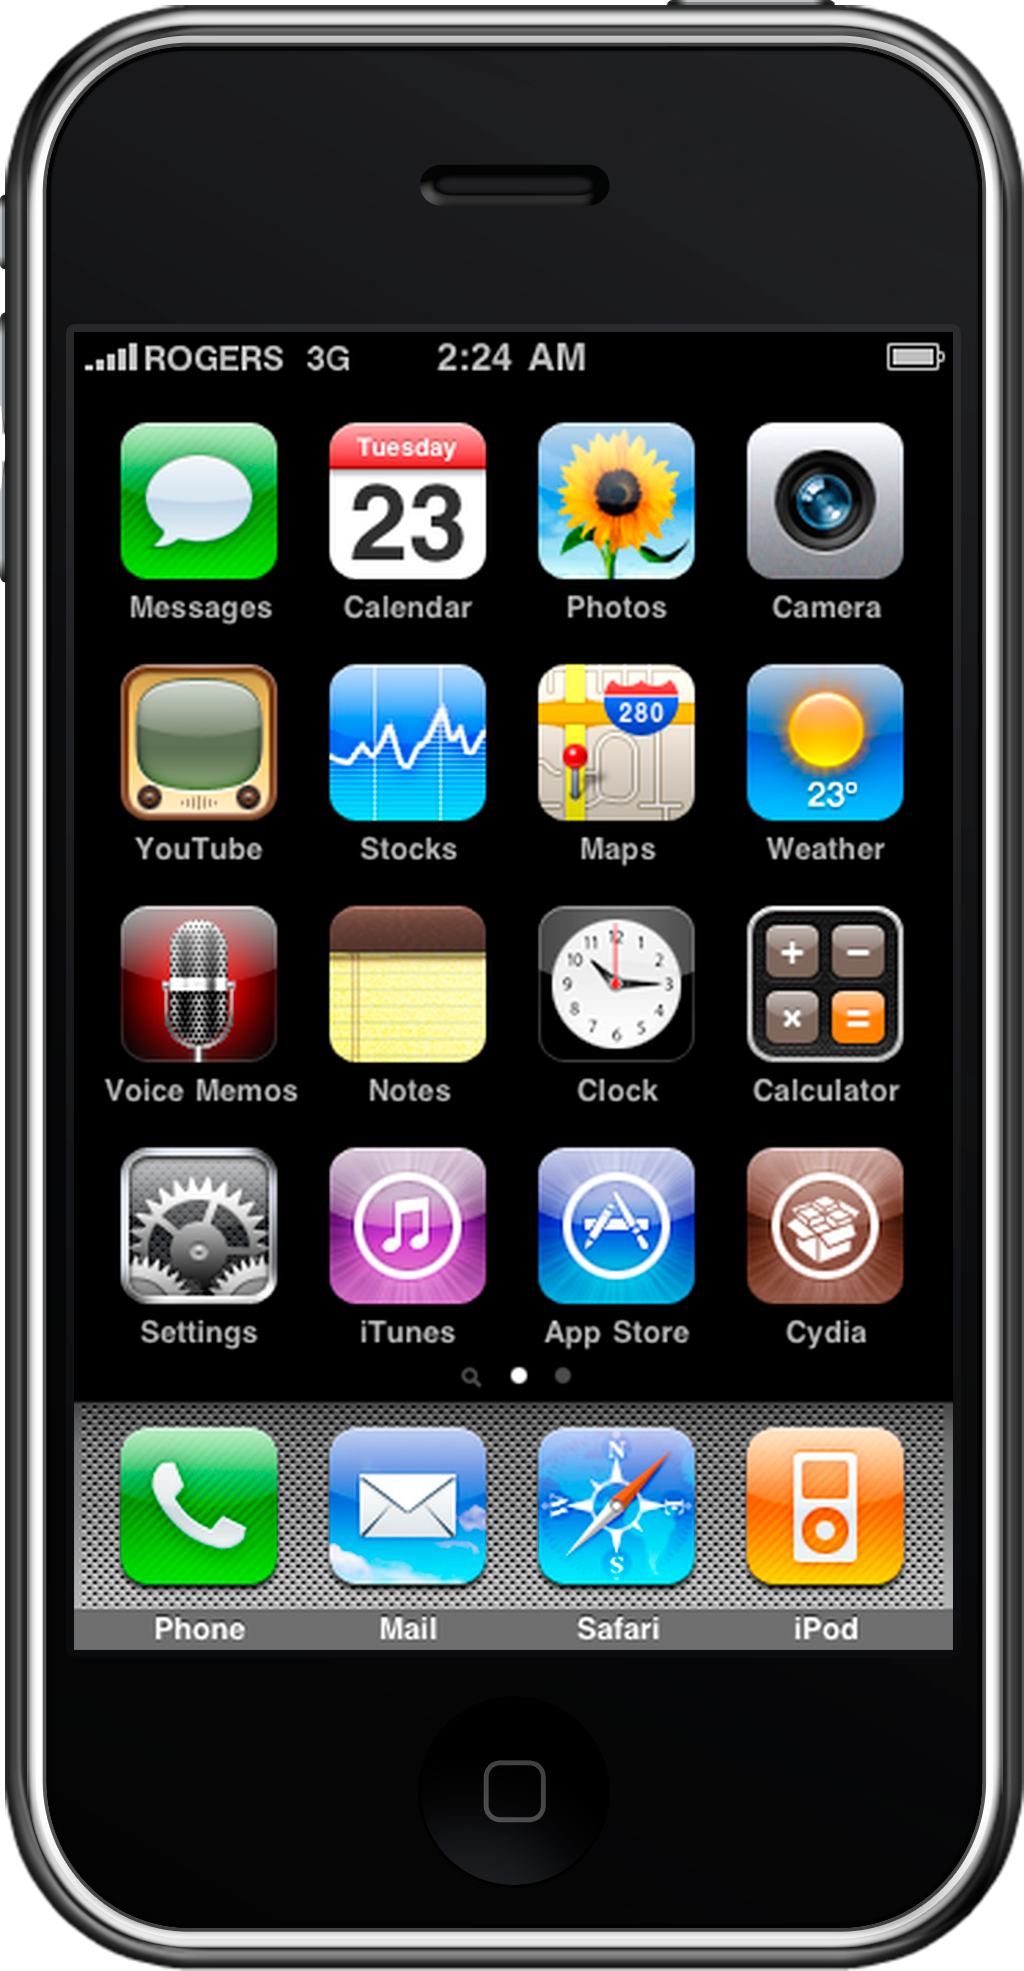 Ремонт iPhone 3G - фото 2 | Сервисный центр Total Apple